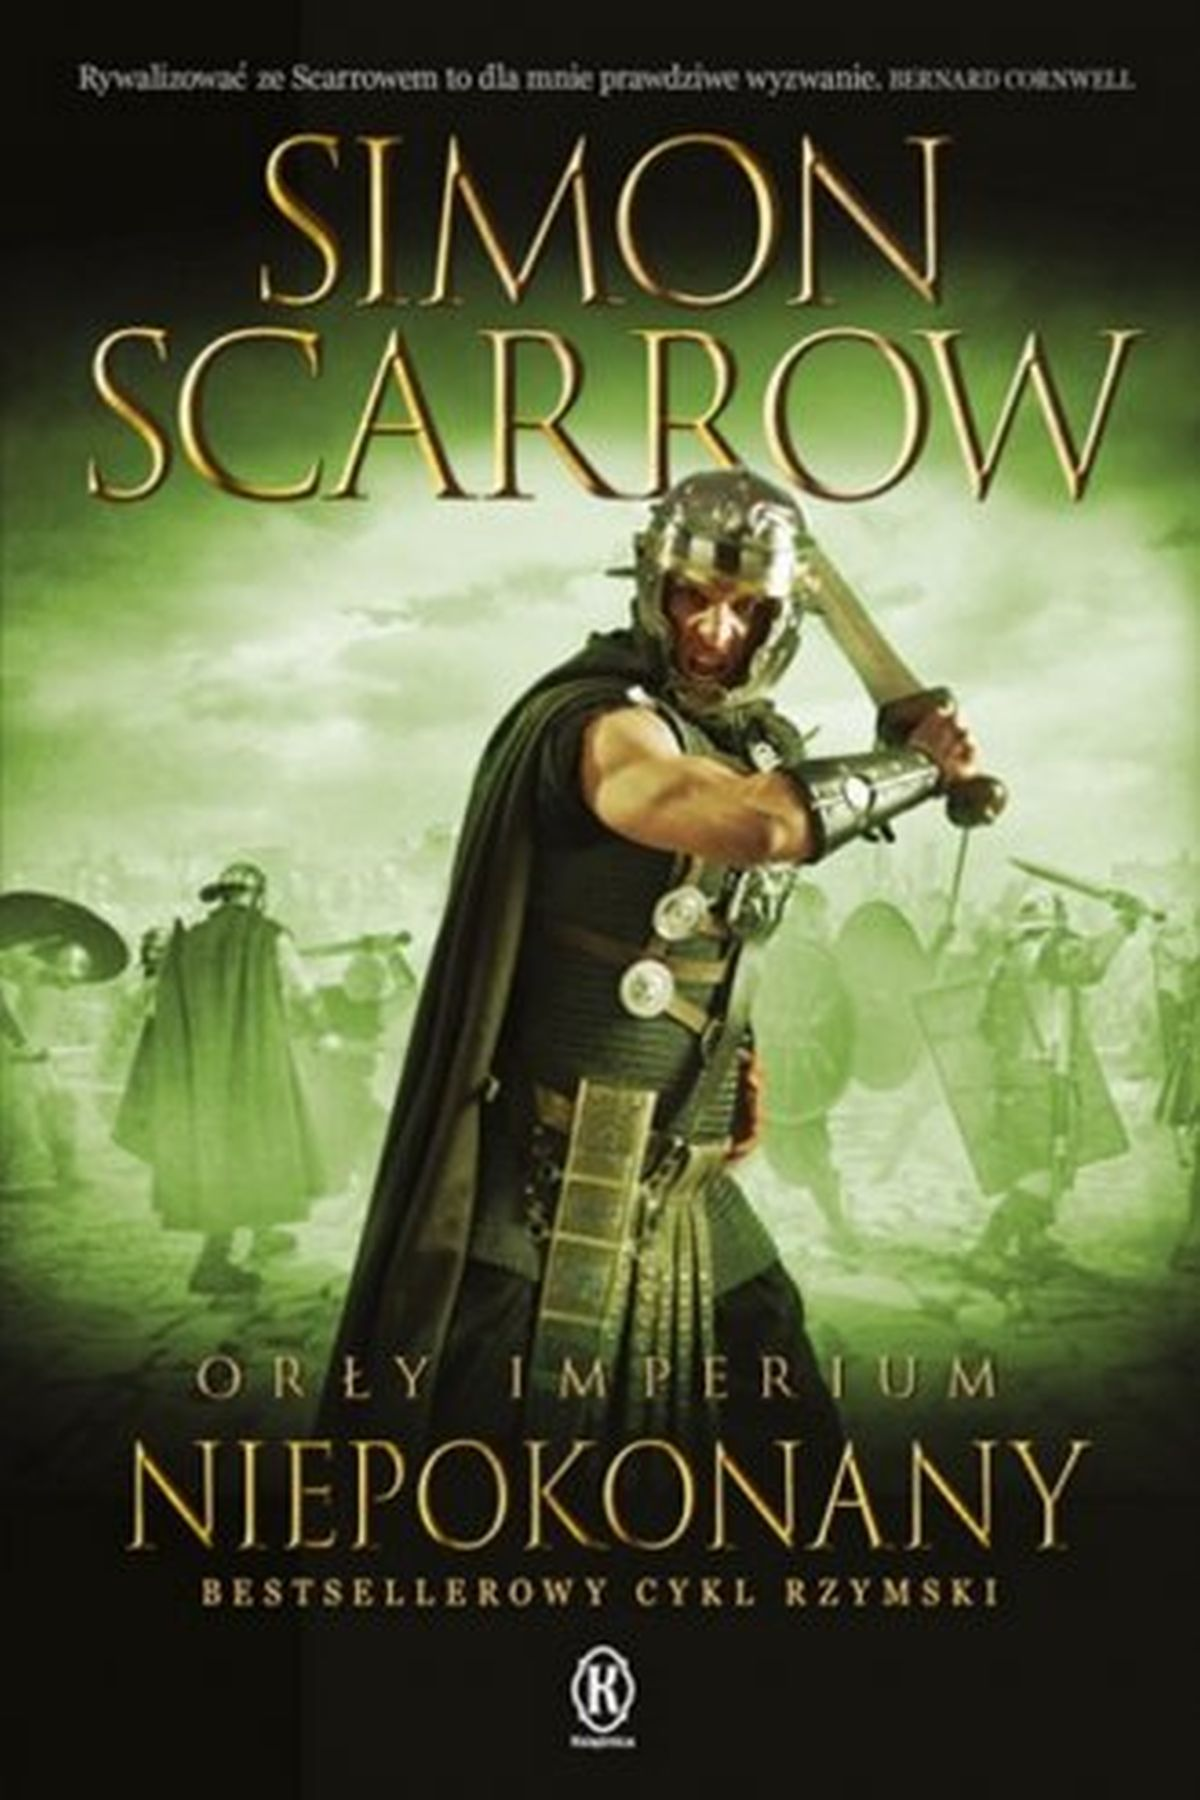 Simon Scarrow, Orły imperium 15. Niepokonany